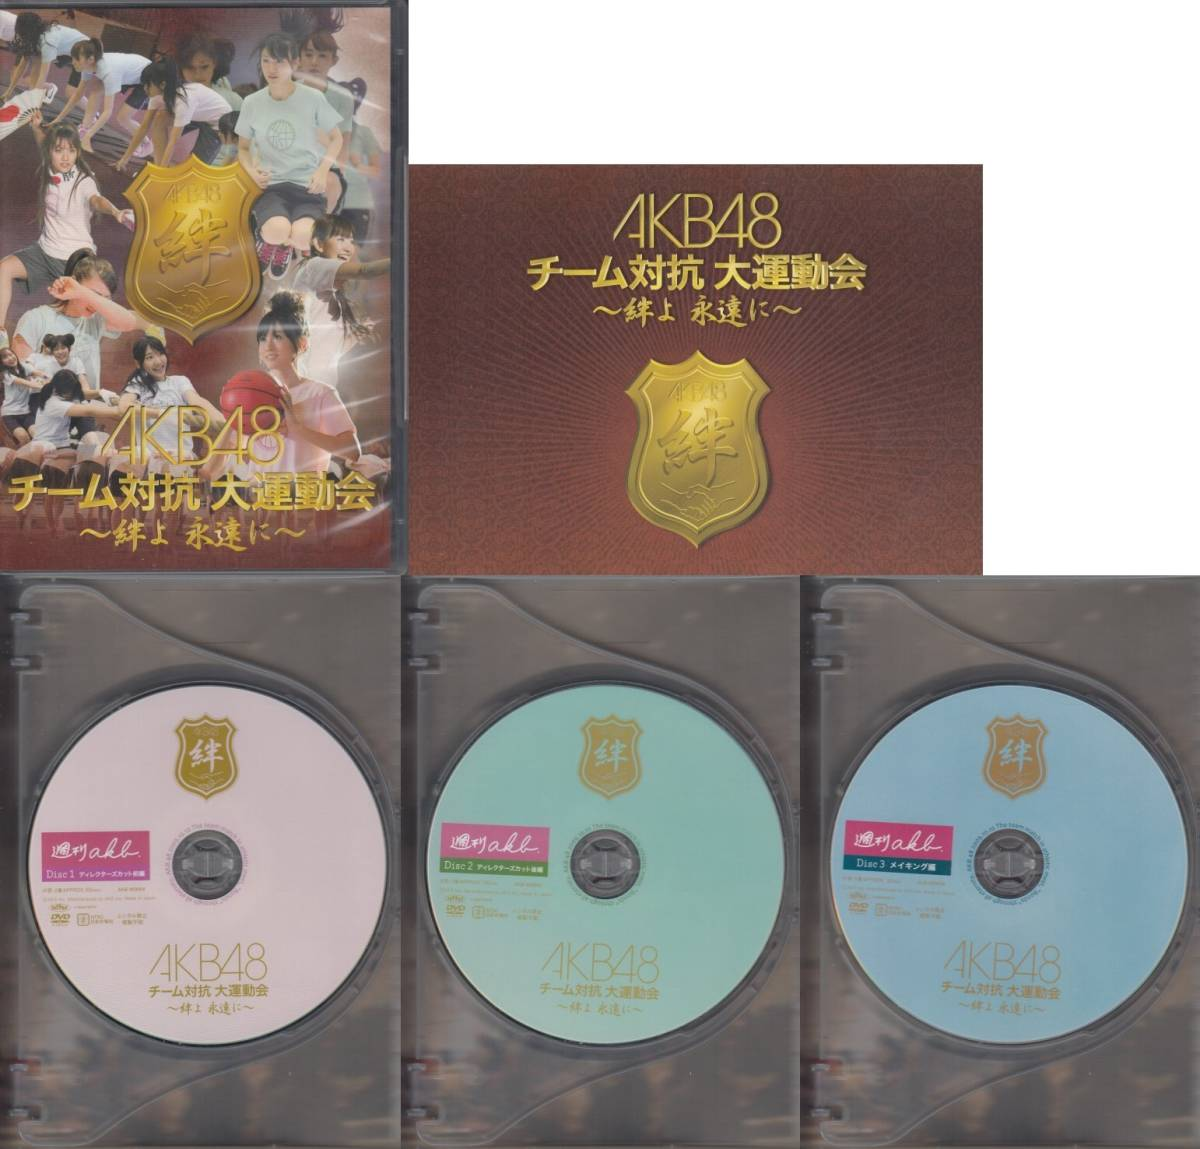 【正規品】[DVD] AKB48 チーム対抗大運動会 ~絆よ 永遠に~ DVDスペシャルBOX [3枚組]/前田敦子/大島優子/指原莉乃/松井珠理奈/松井玲奈_画像3